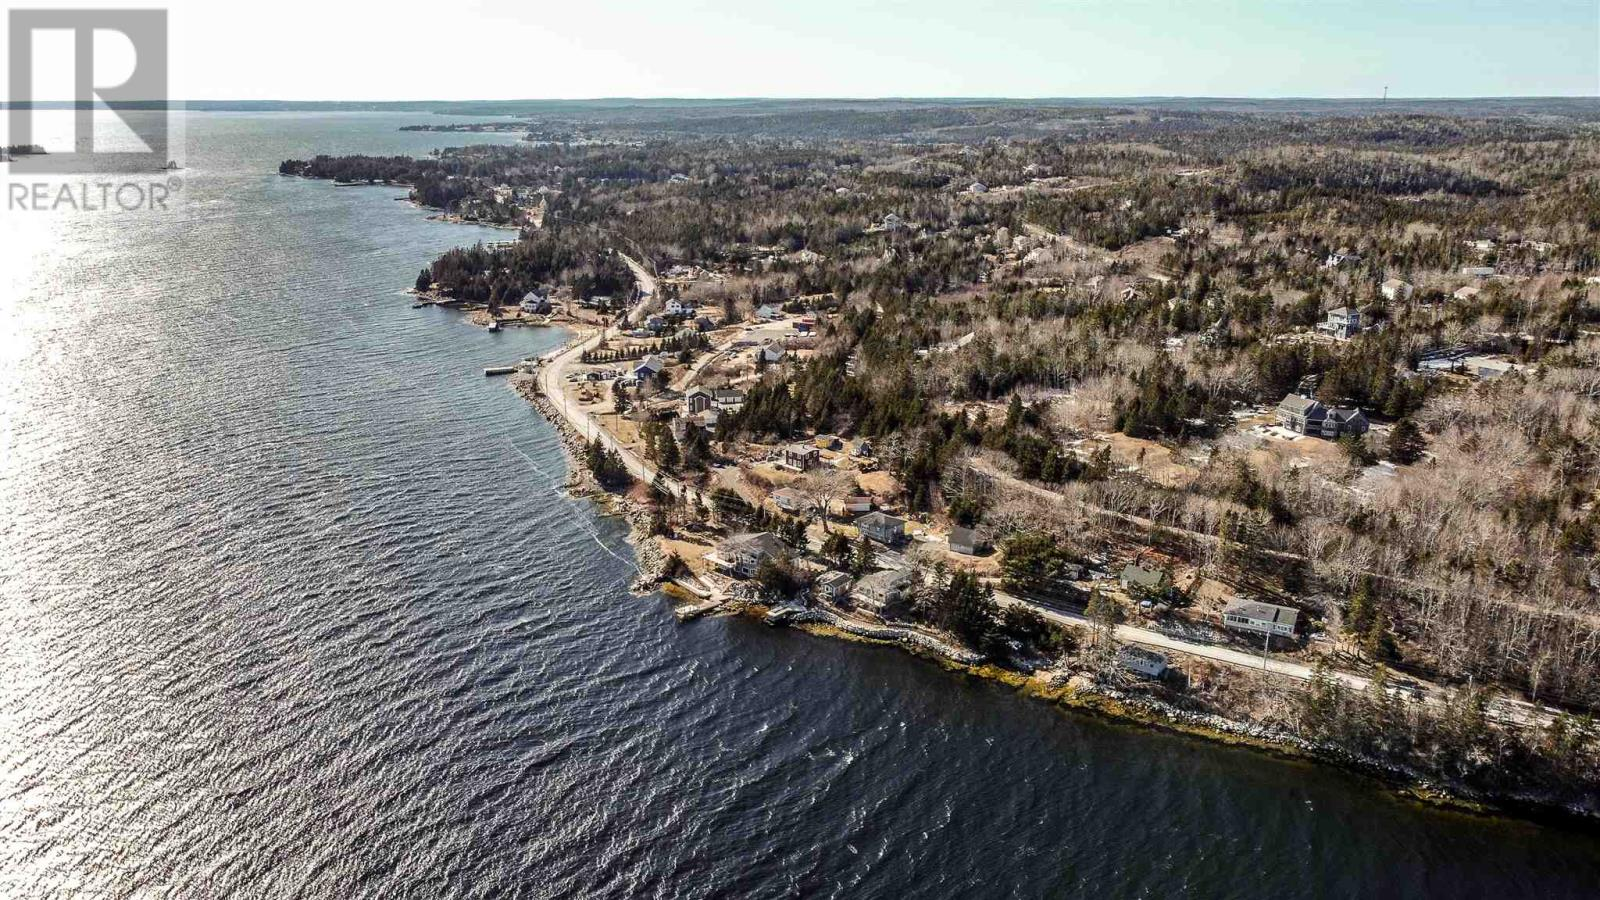 Lot B 293 Hillside Drive, Boutiliers Point, Nova Scotia  B3Z 1W9 - Photo 3 - 202106634